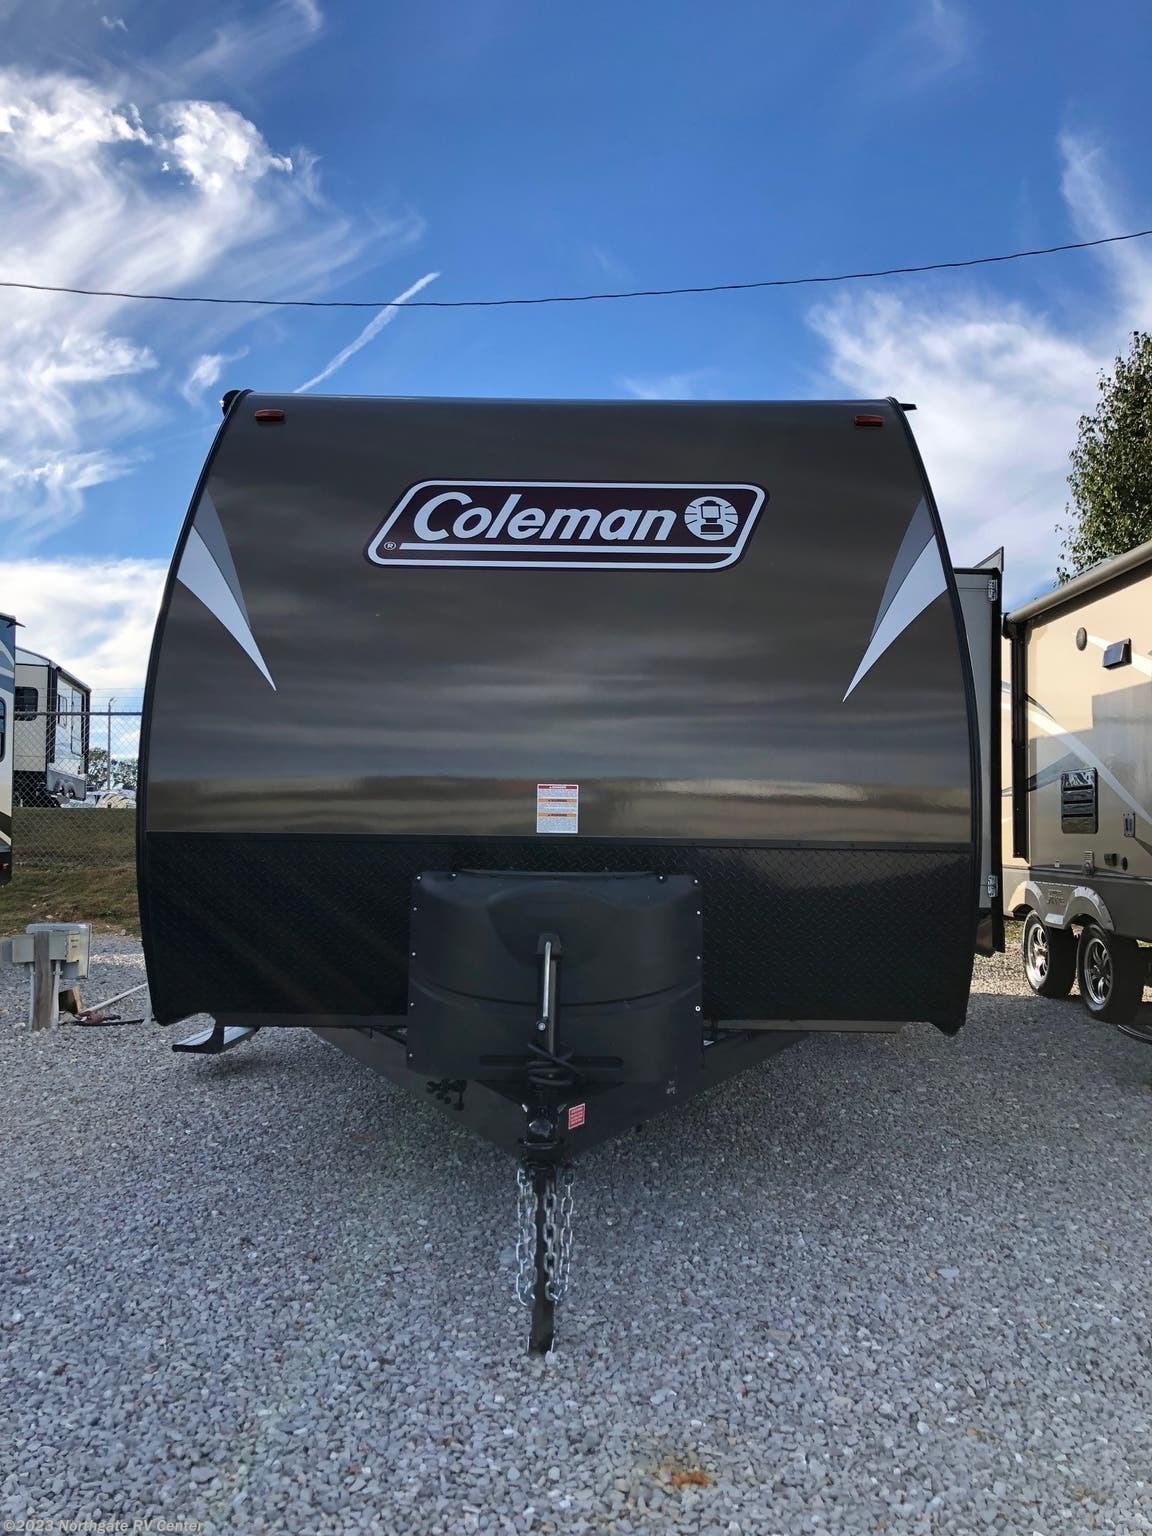 Hm938037 2017 Dutchmen Coleman Light 2405bh For Sale In Ringgold Ga Wiring Diagram Next